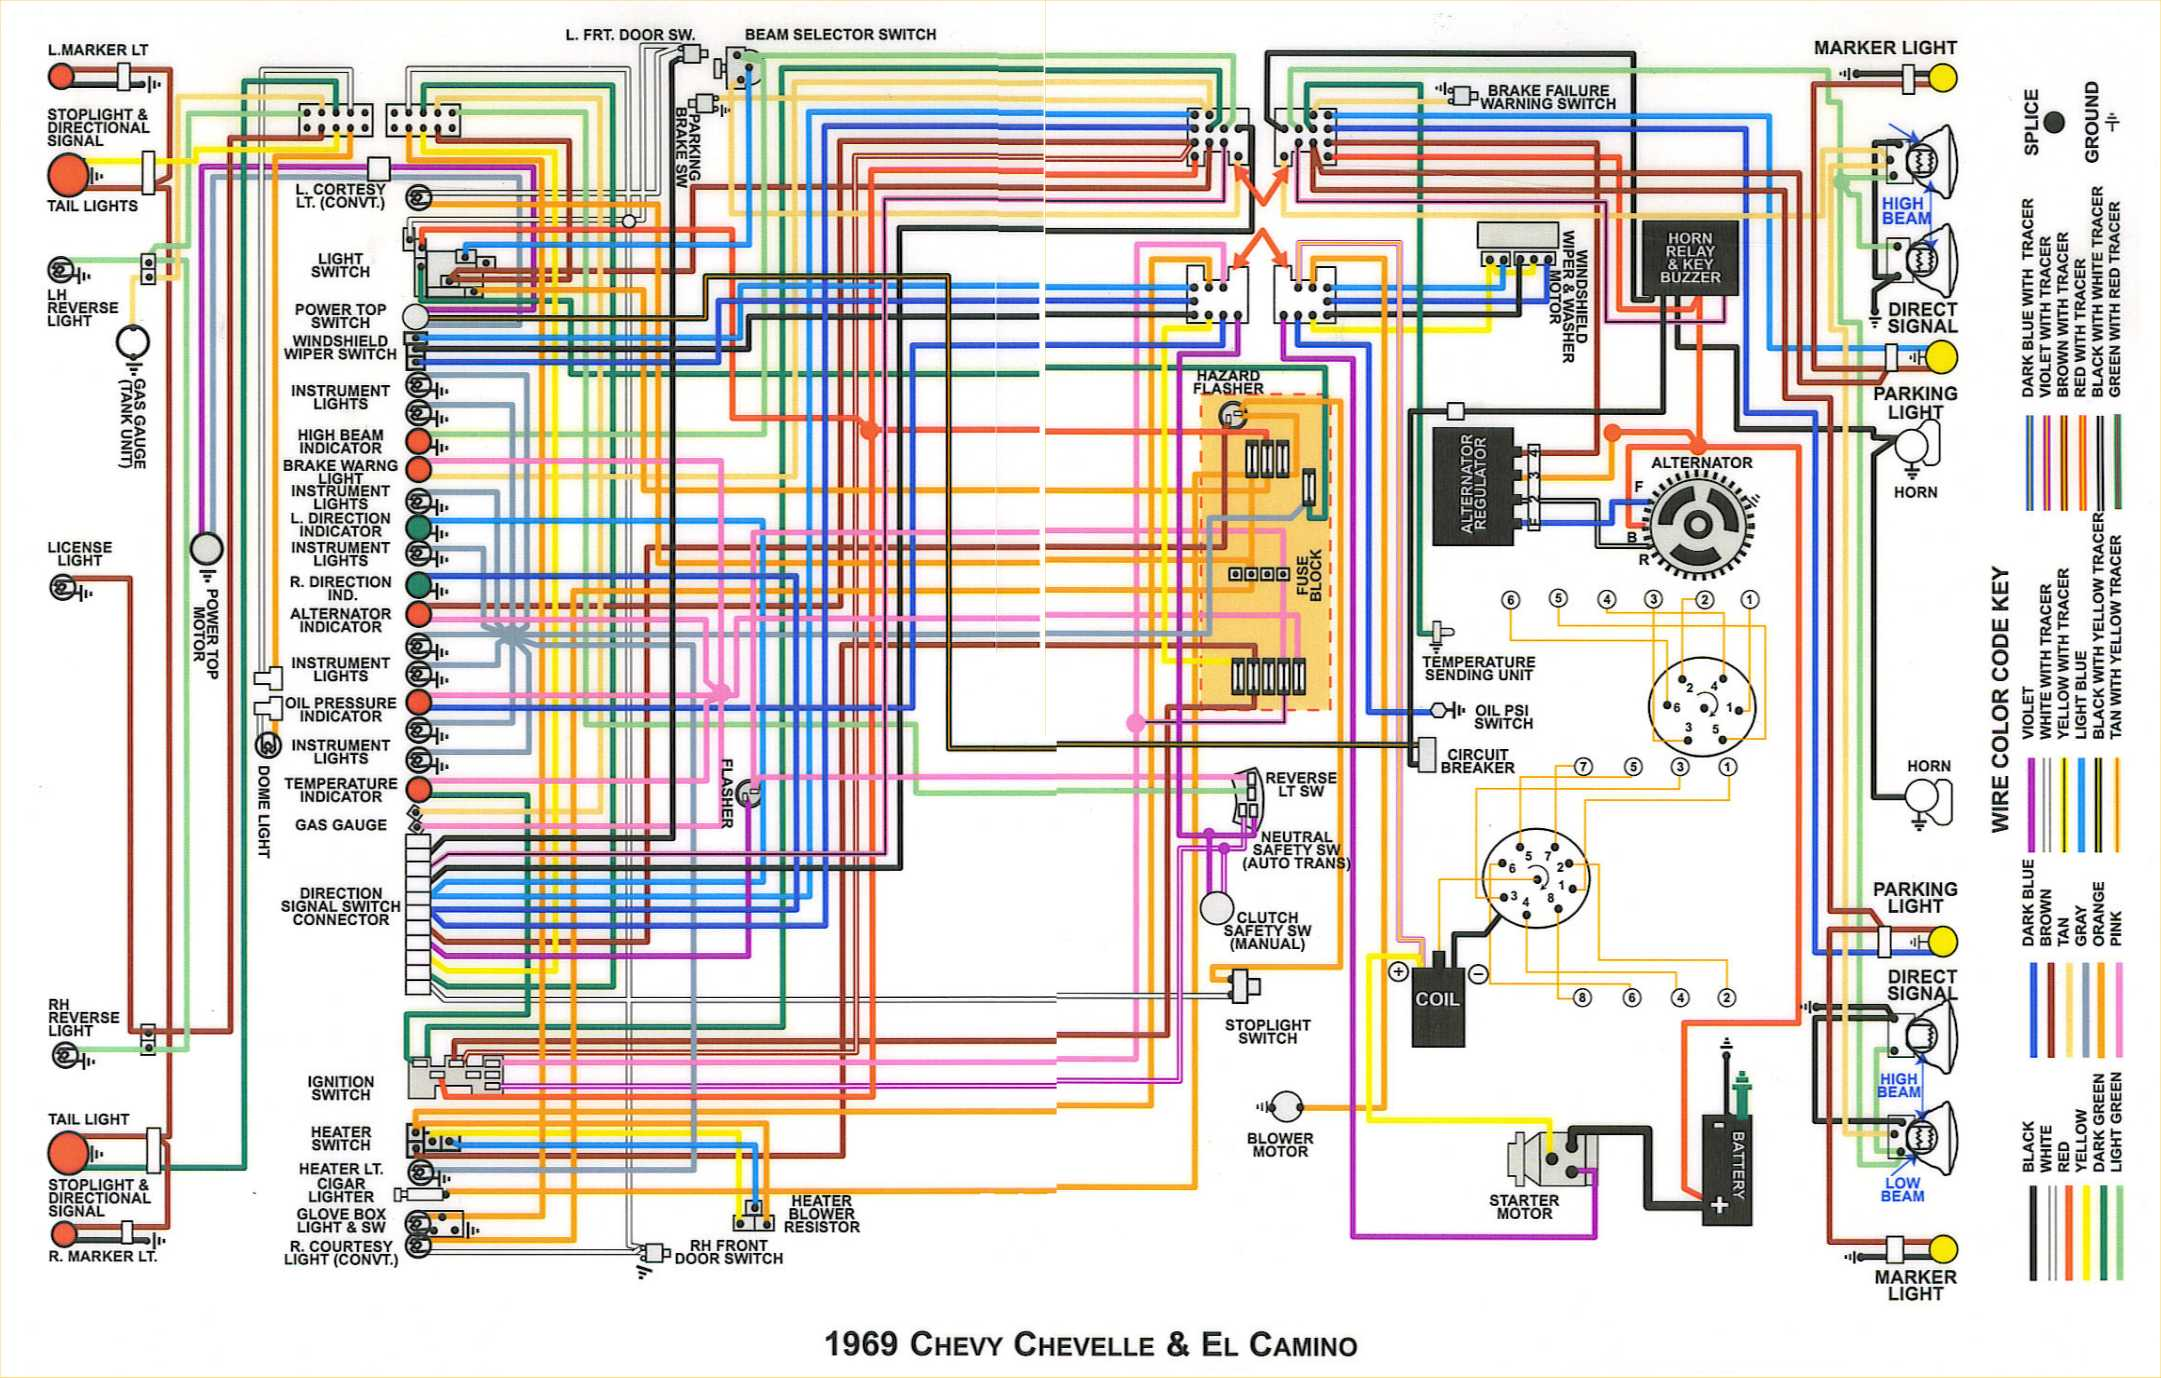 Wiring Diagram For  Corvette  The Wiring Diagram  Readingratnet - 1968 pontiac lemans wiring diagram